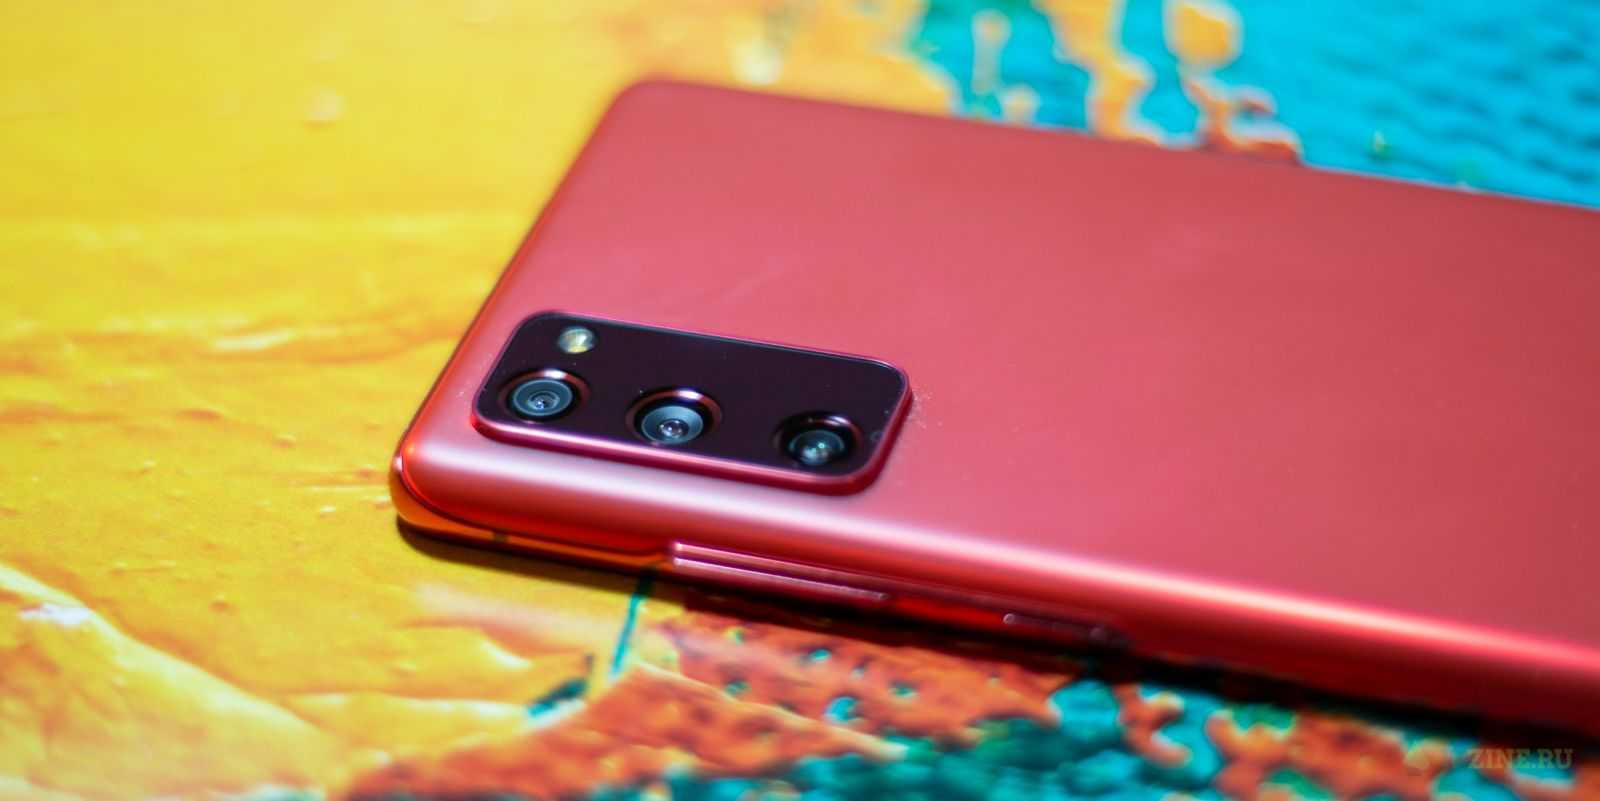 Обзор Samsung Galaxy S20 FE: недорогой, но флагман (DSC 9766)